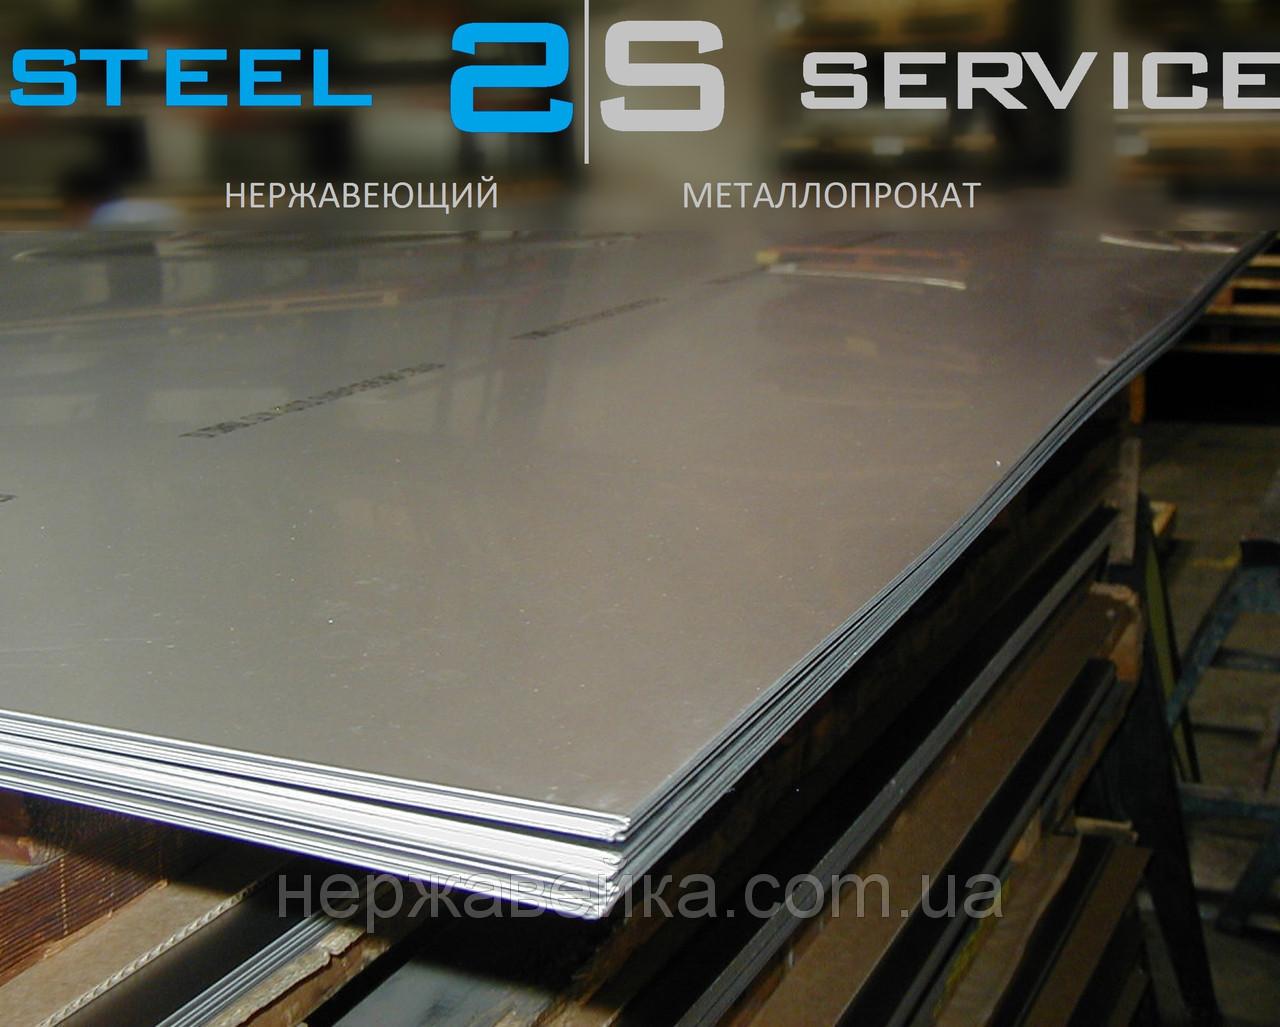 Нержавейка лист 1х1000х2000мм  AISI 316Ti(10Х17Н13М2Т) 2B - матовый,  кислотостойкий